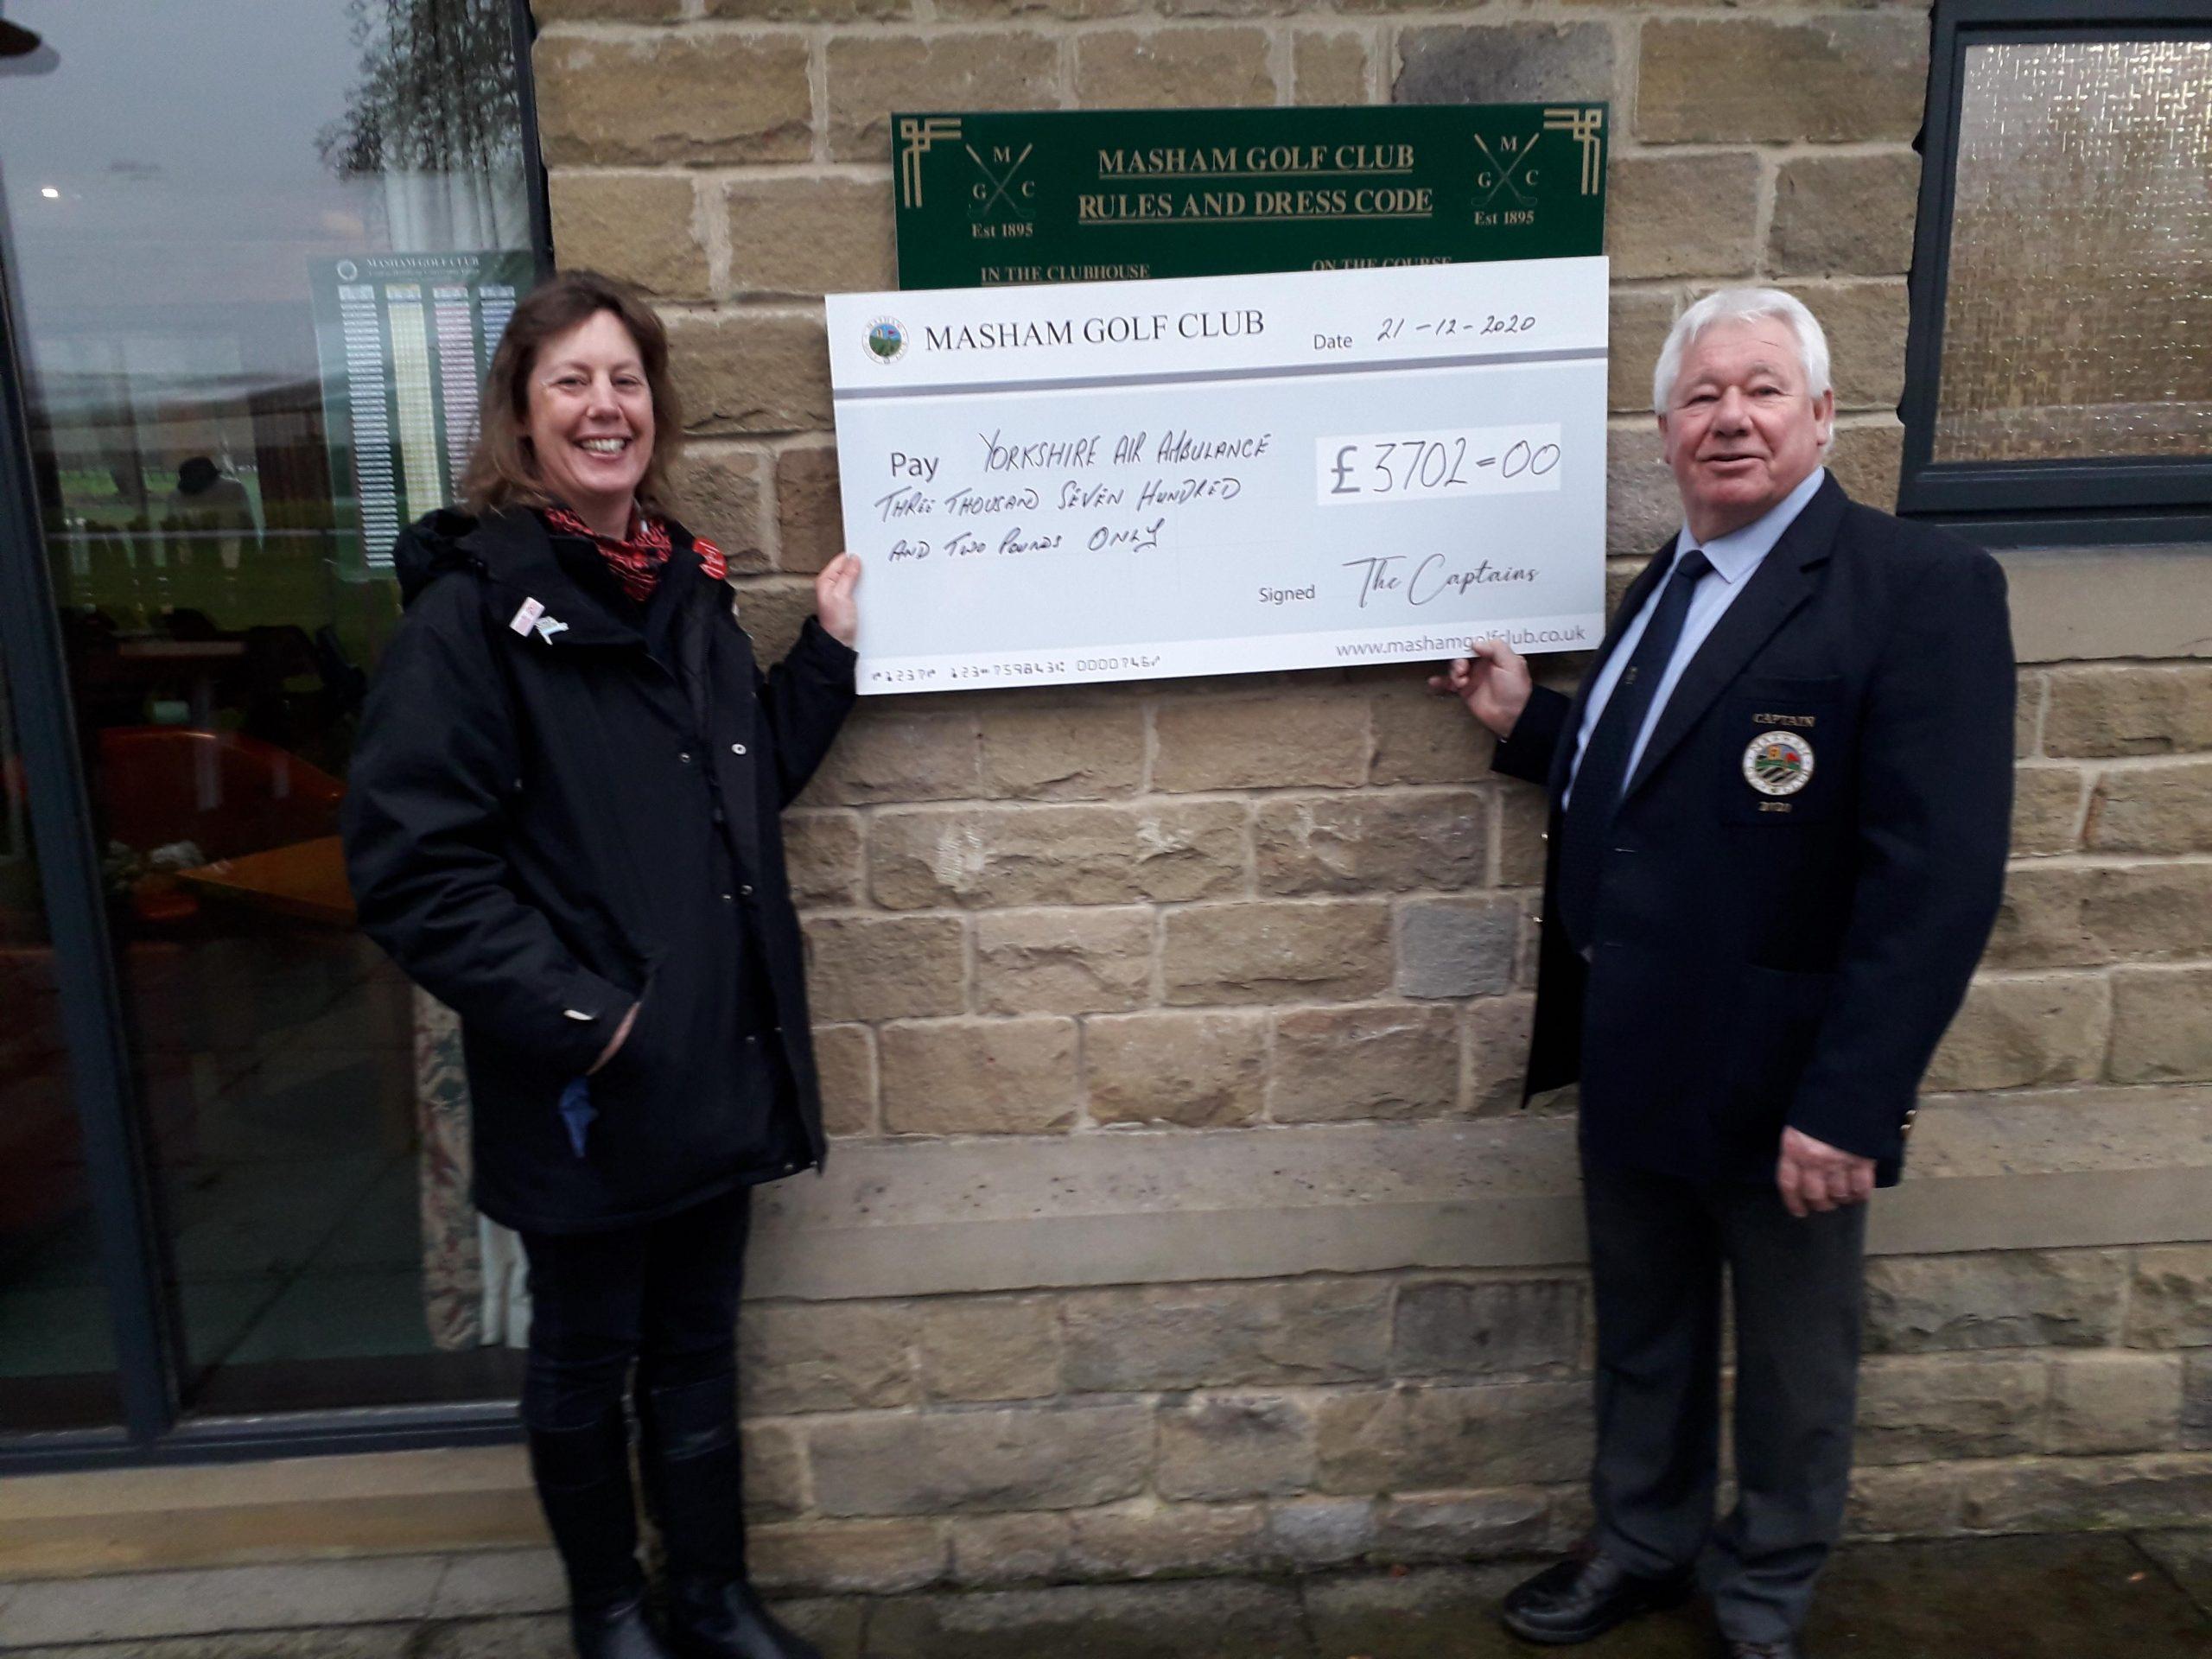 Masham Golf Club with a cheque